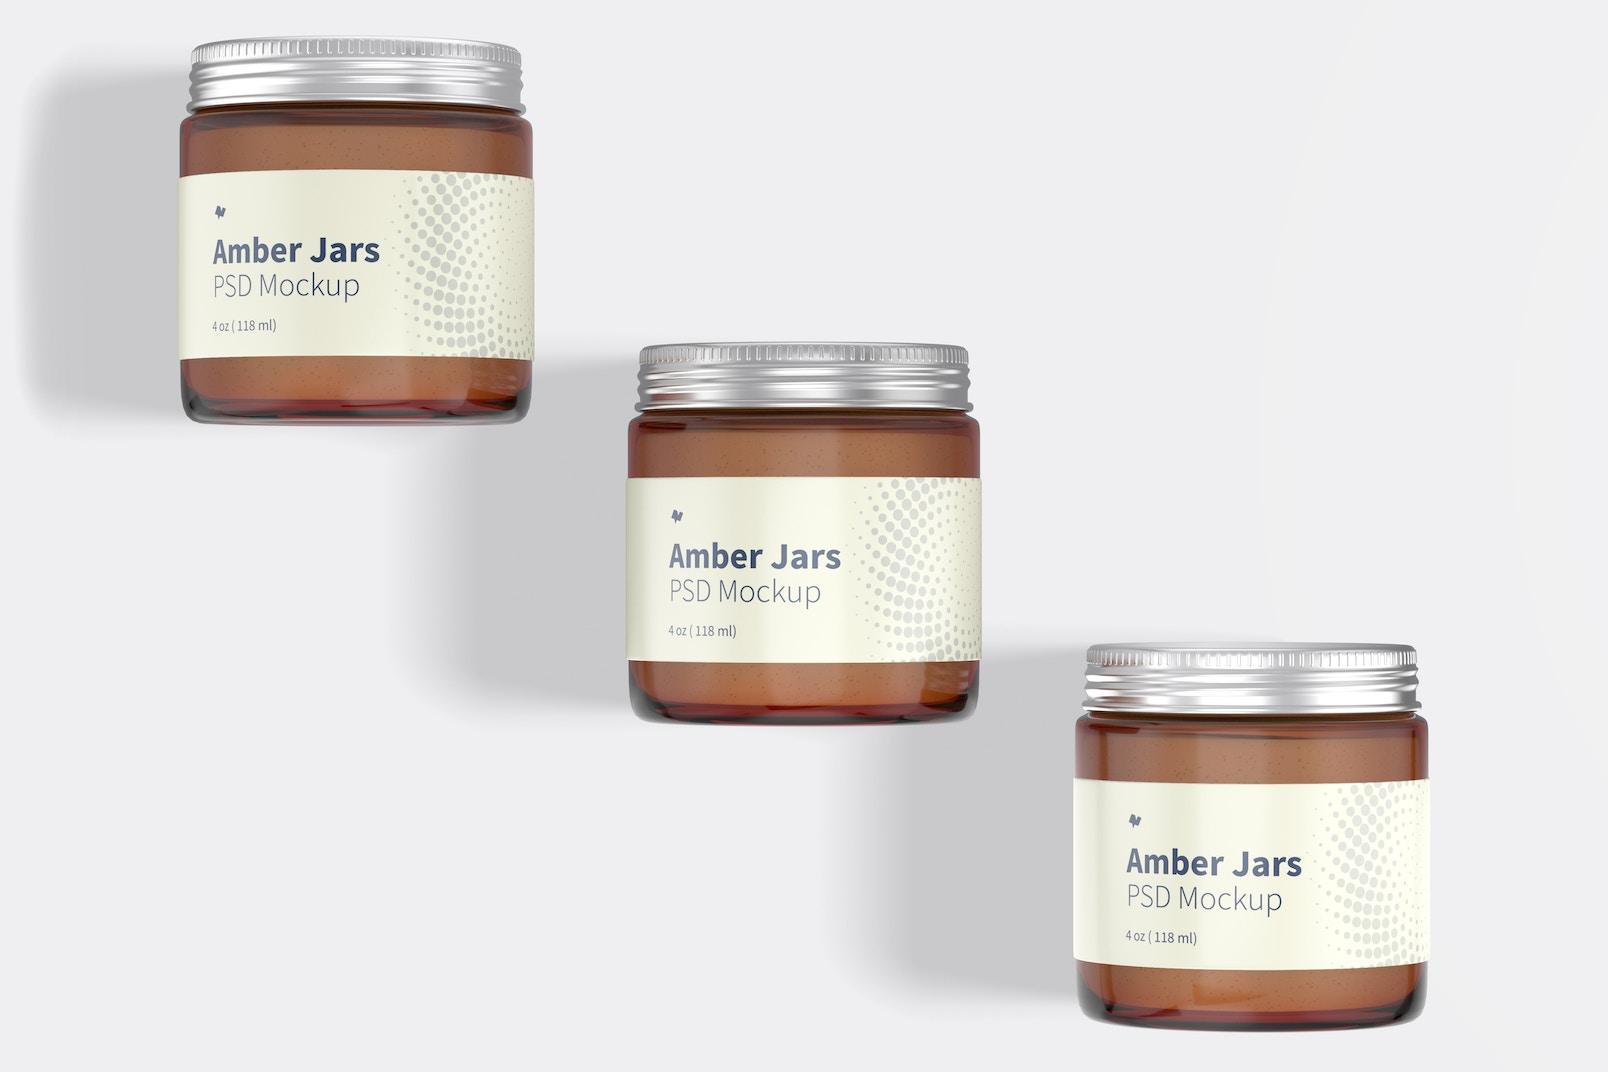 Amber Jars with Metallic Cap Mockup, Top View